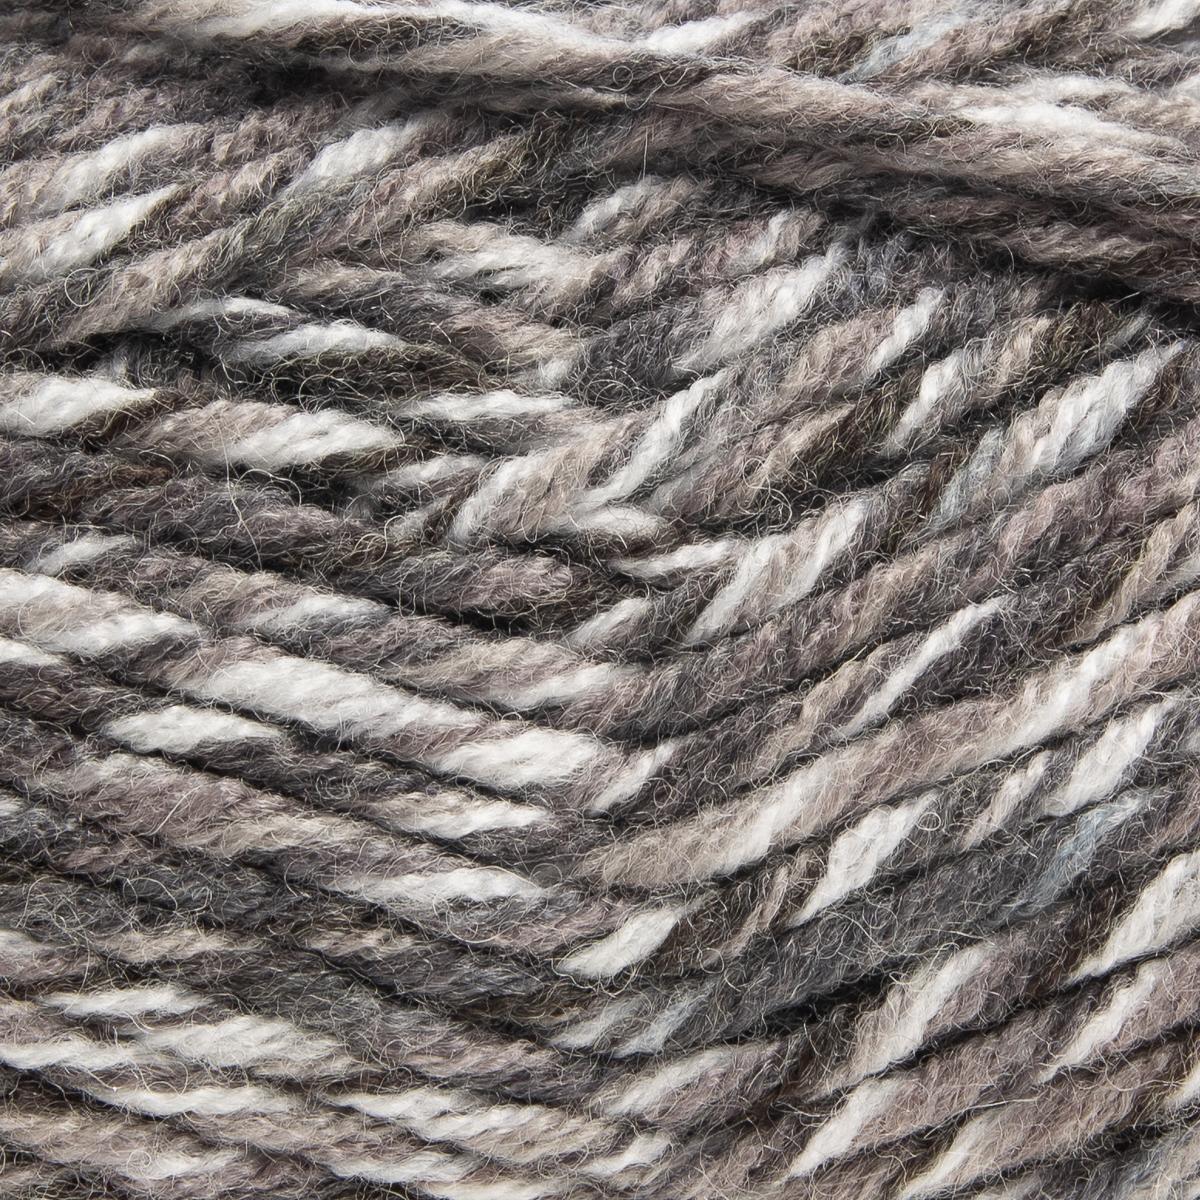 3pk-Lion-Brand-Woolspun-Acrylic-amp-Wool-Yarn-Bulky-5-Knit-Crocheting-Skeins-Soft thumbnail 23